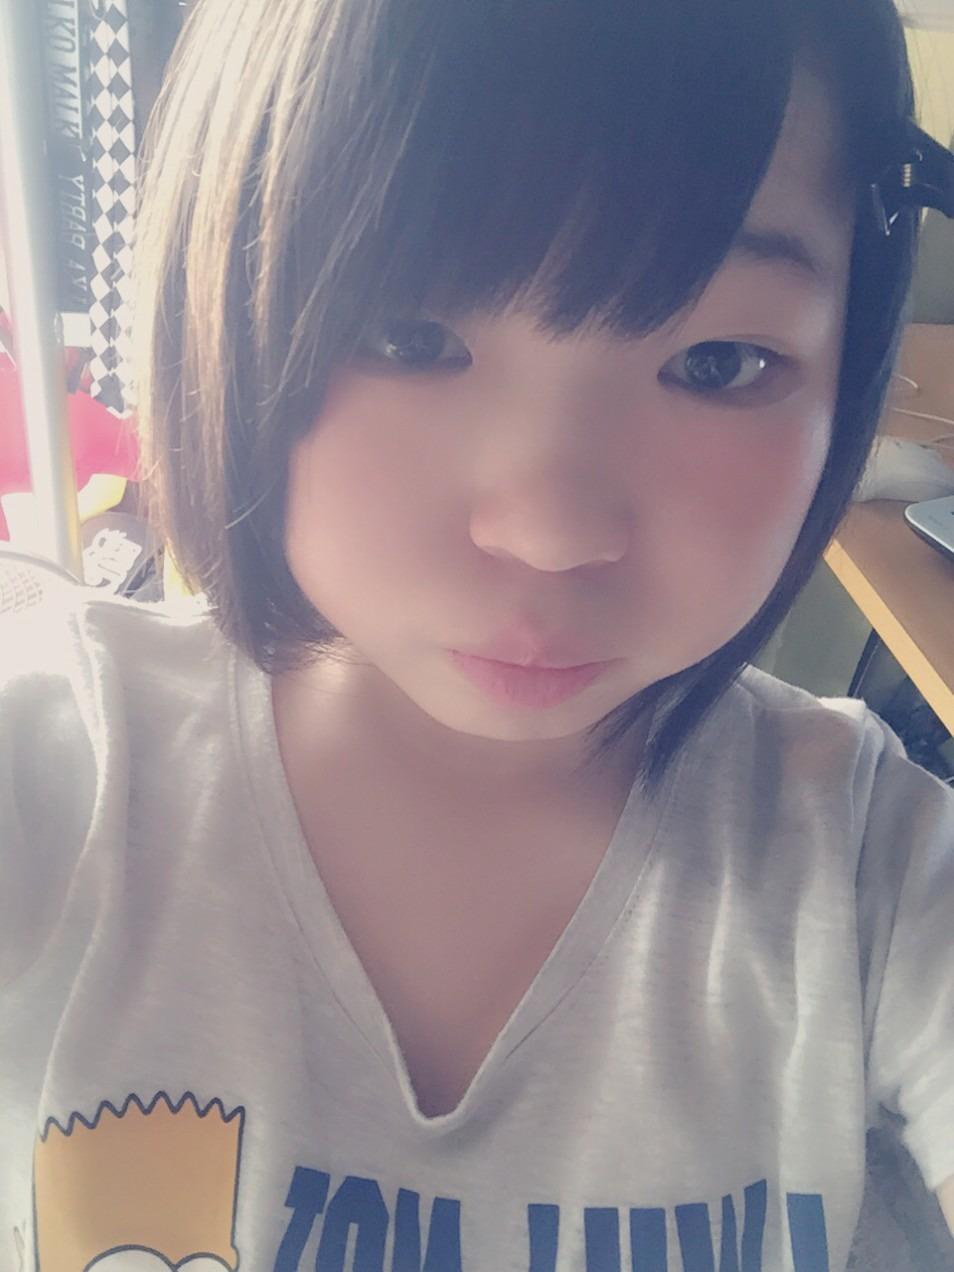 Asiauncensored Japan Sex Reira Aisaki Yui Aoyama 愛咲れいら青山ゆい